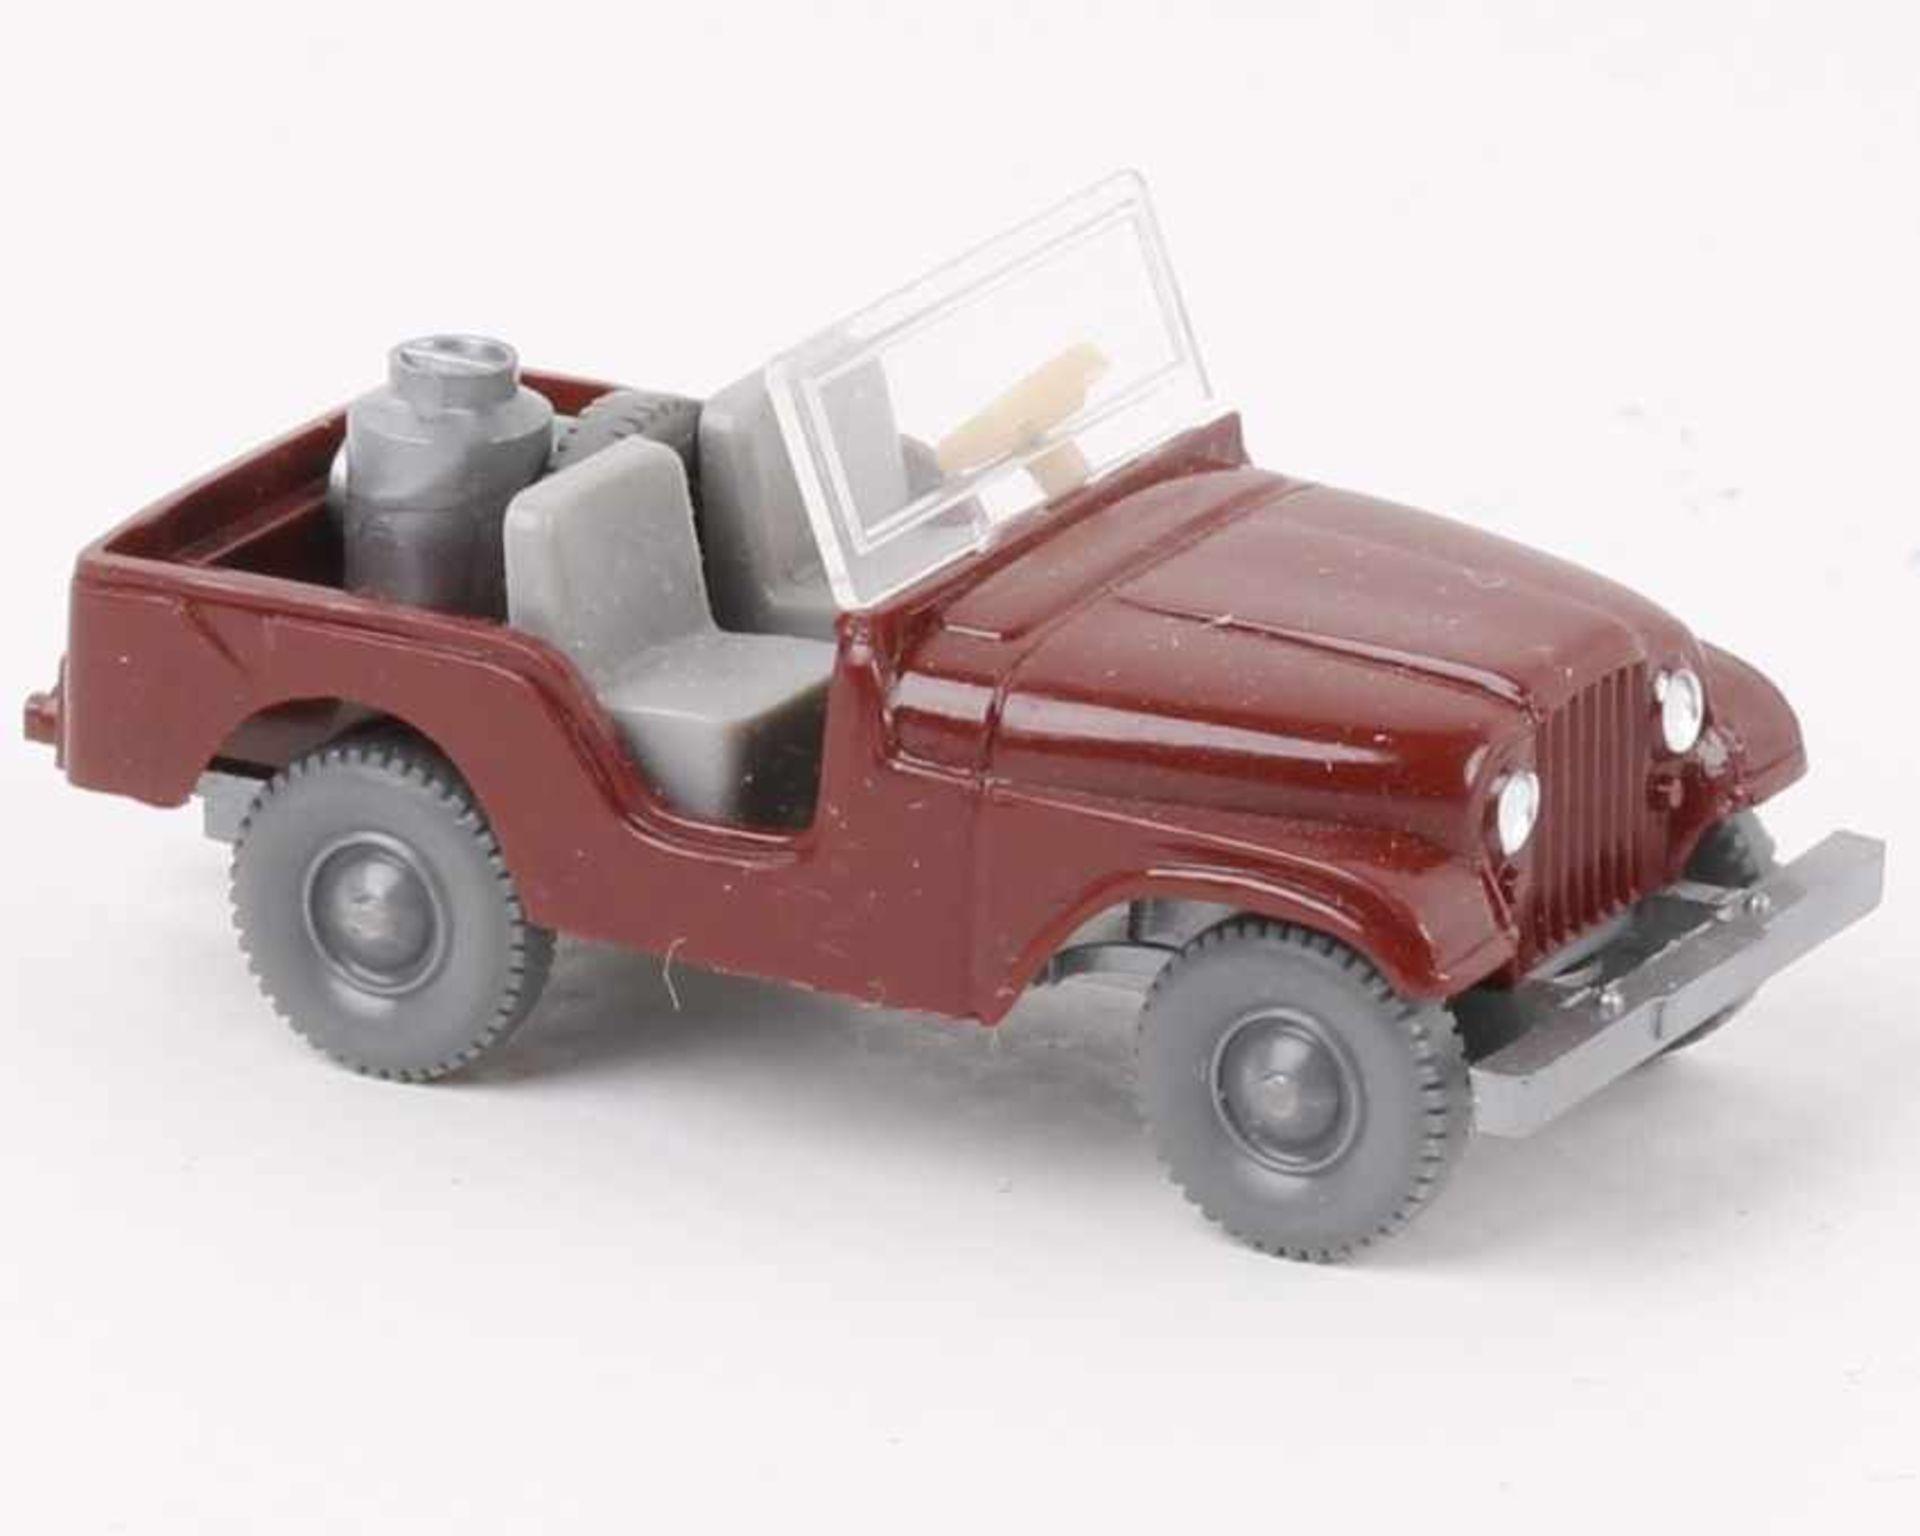 WikingFarmer Jeep braunrot12/2a, neuwertig